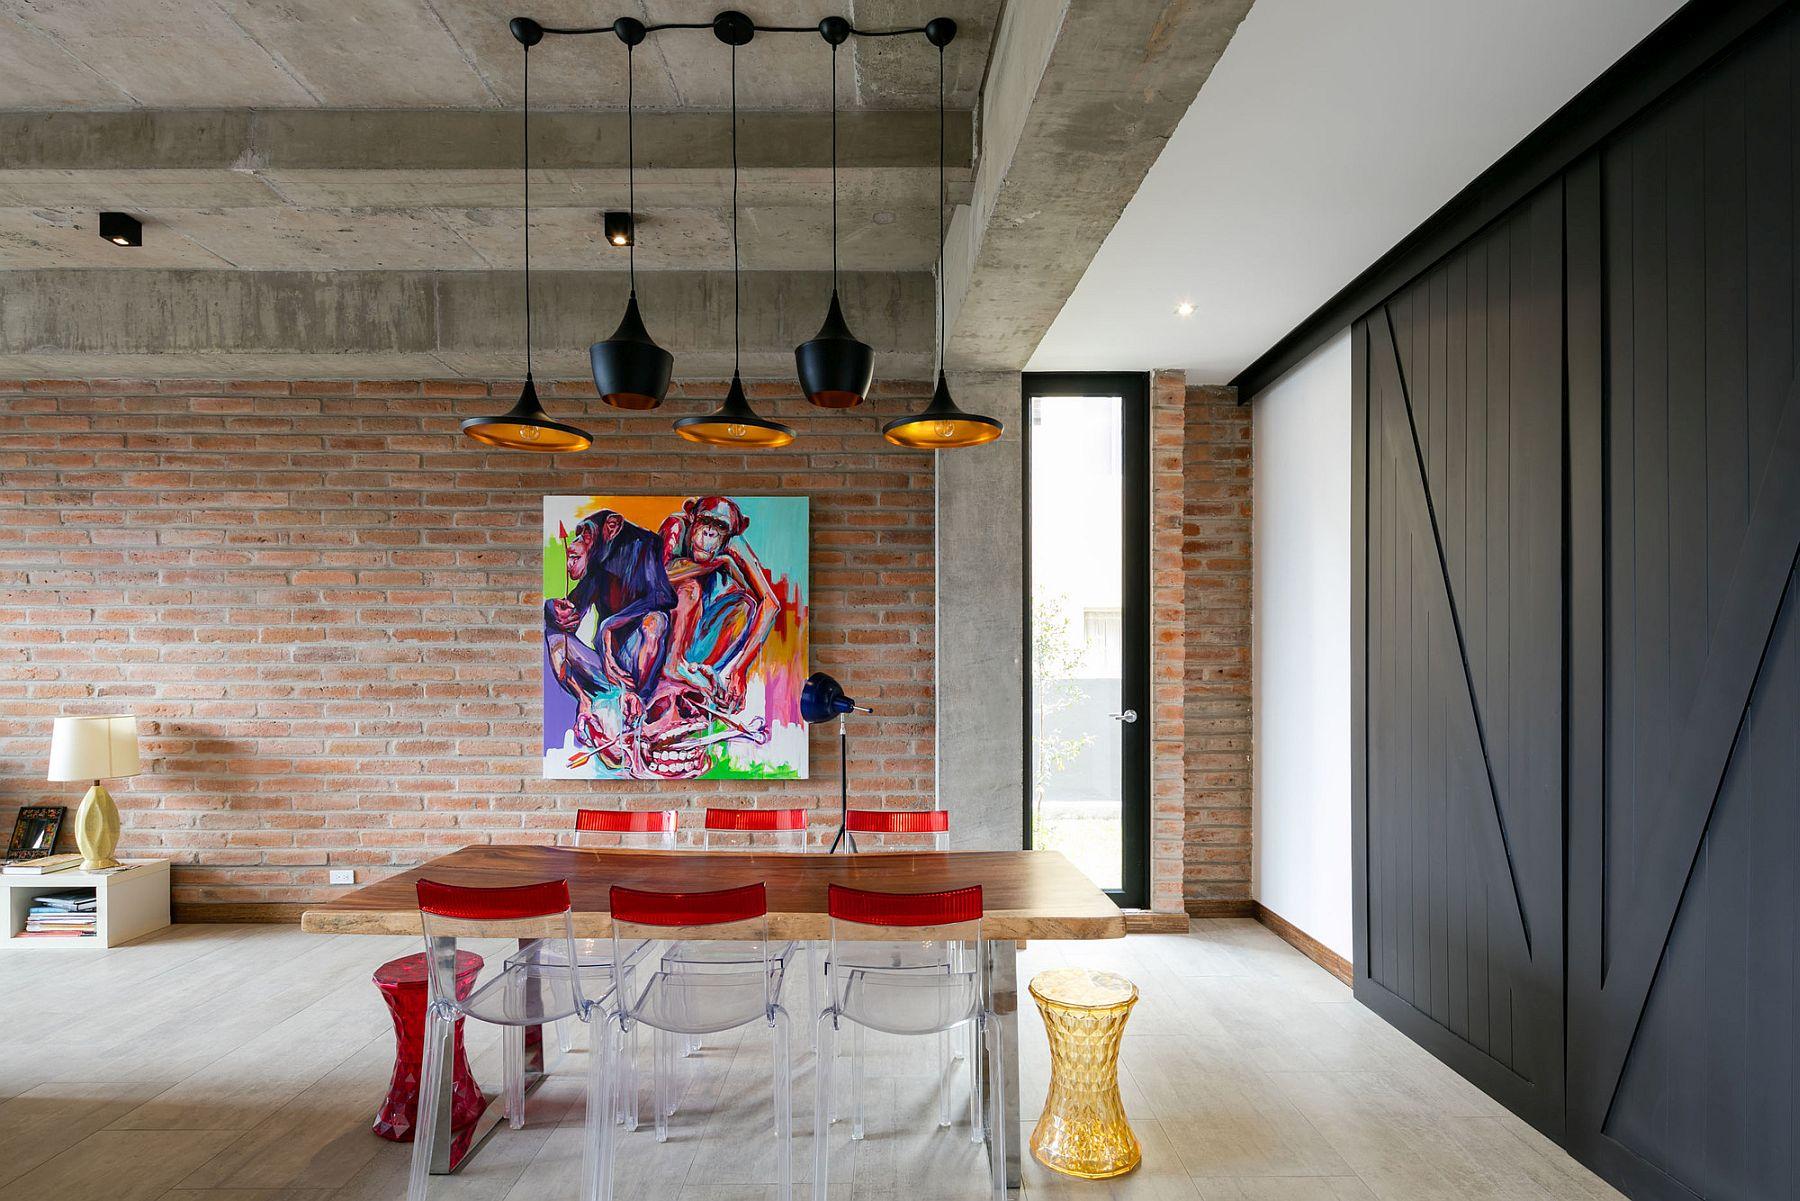 Tom Dixon pendant lights illuminate the industrial modern dining room